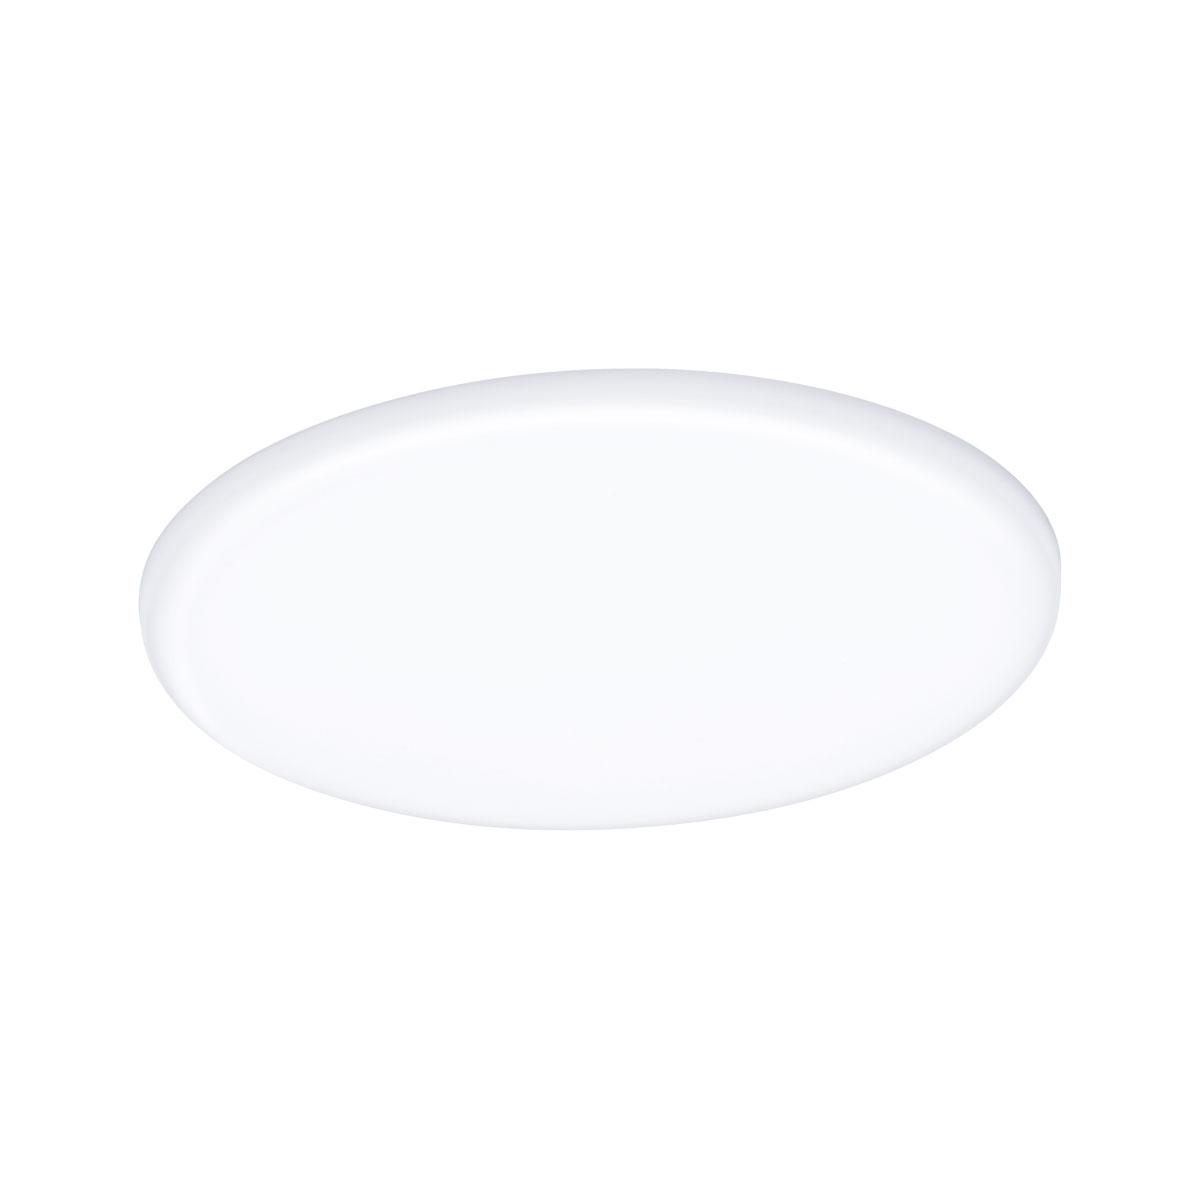 "LED-Deckenleuchte ""Veluna VariFit"", Ø18,5cm, 3000K, weiß 3000 k | 18,5 cm"